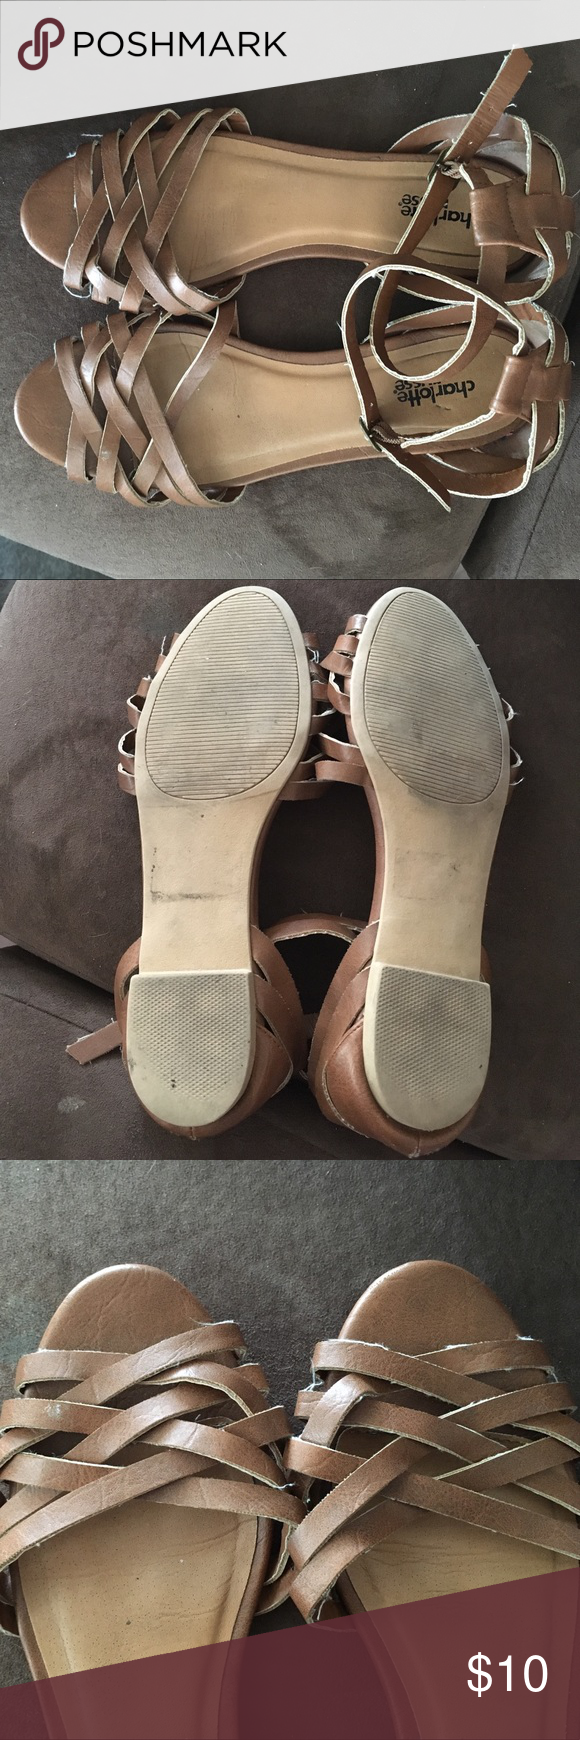 Brown Sandals Size 7.5 Charlotte Russe sandals, worn quite a bit but still cute! Charlotte Russe Shoes Sandals